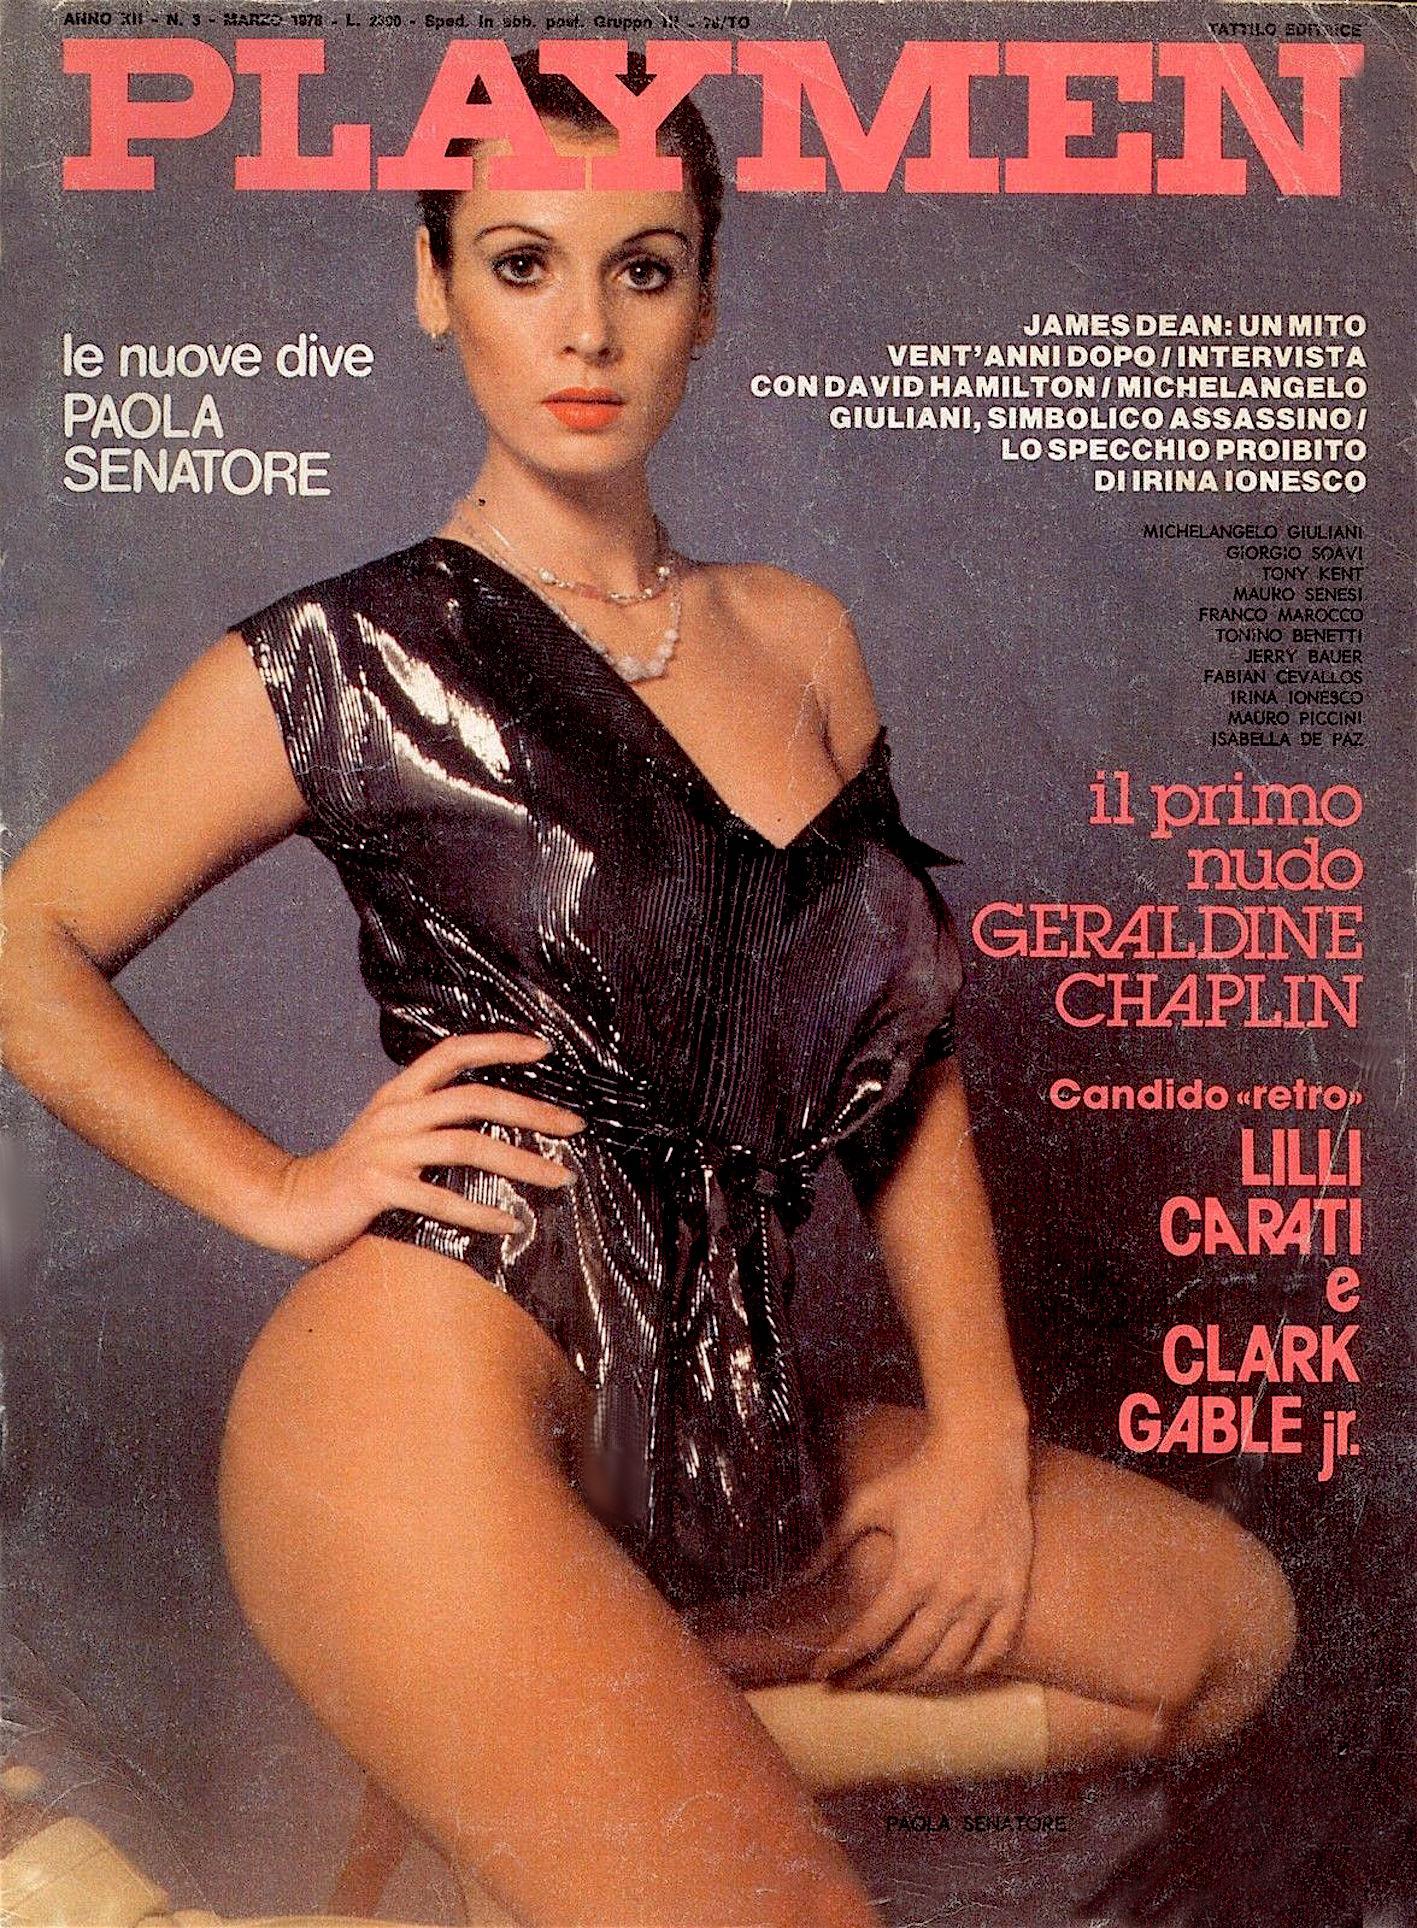 paola senatore playmen copertina 1978